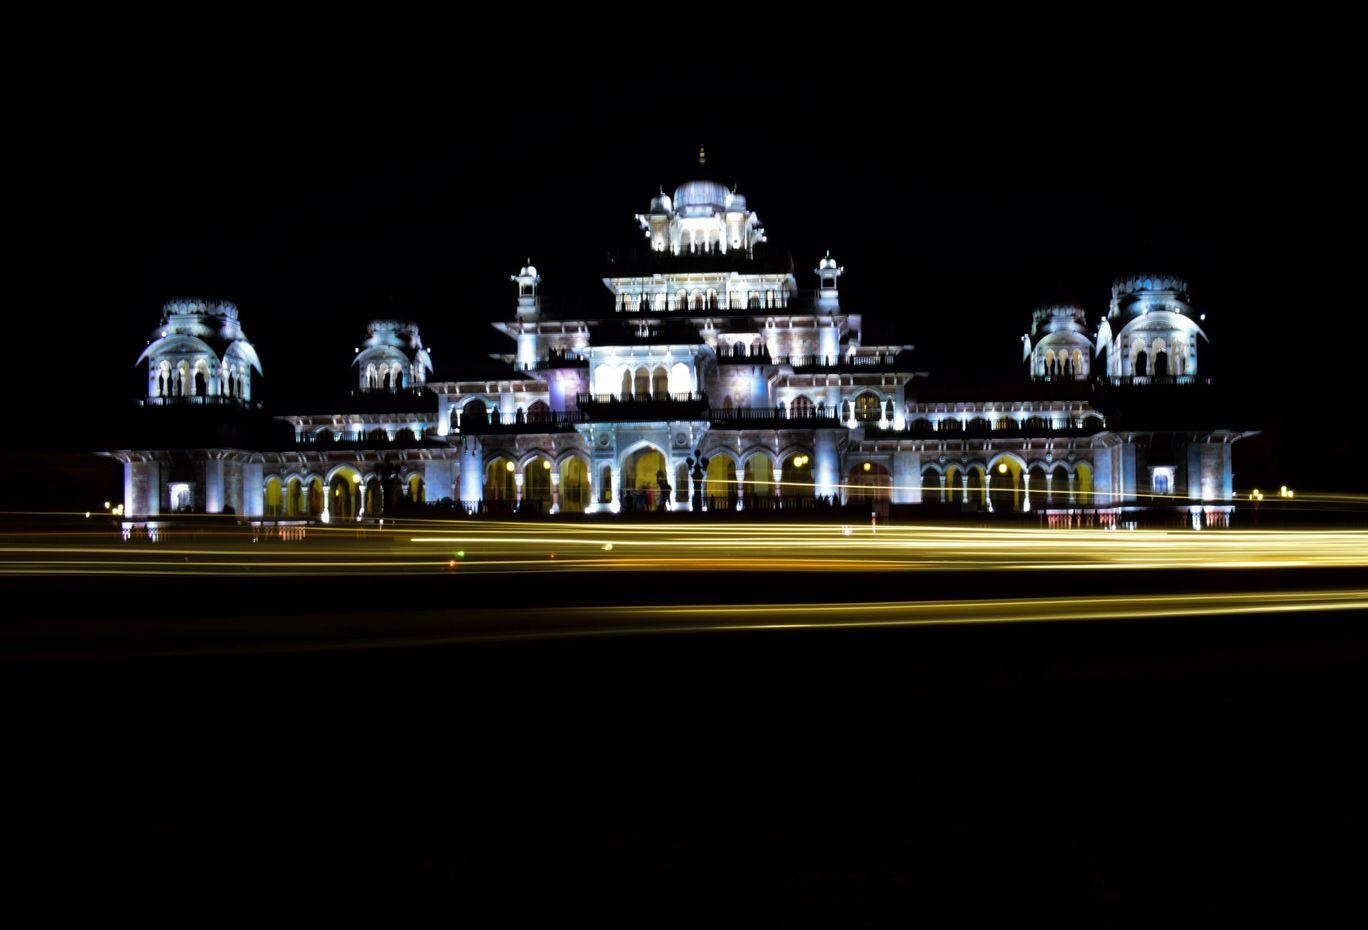 Photo of Albert Hall Museum By Sony Rajput